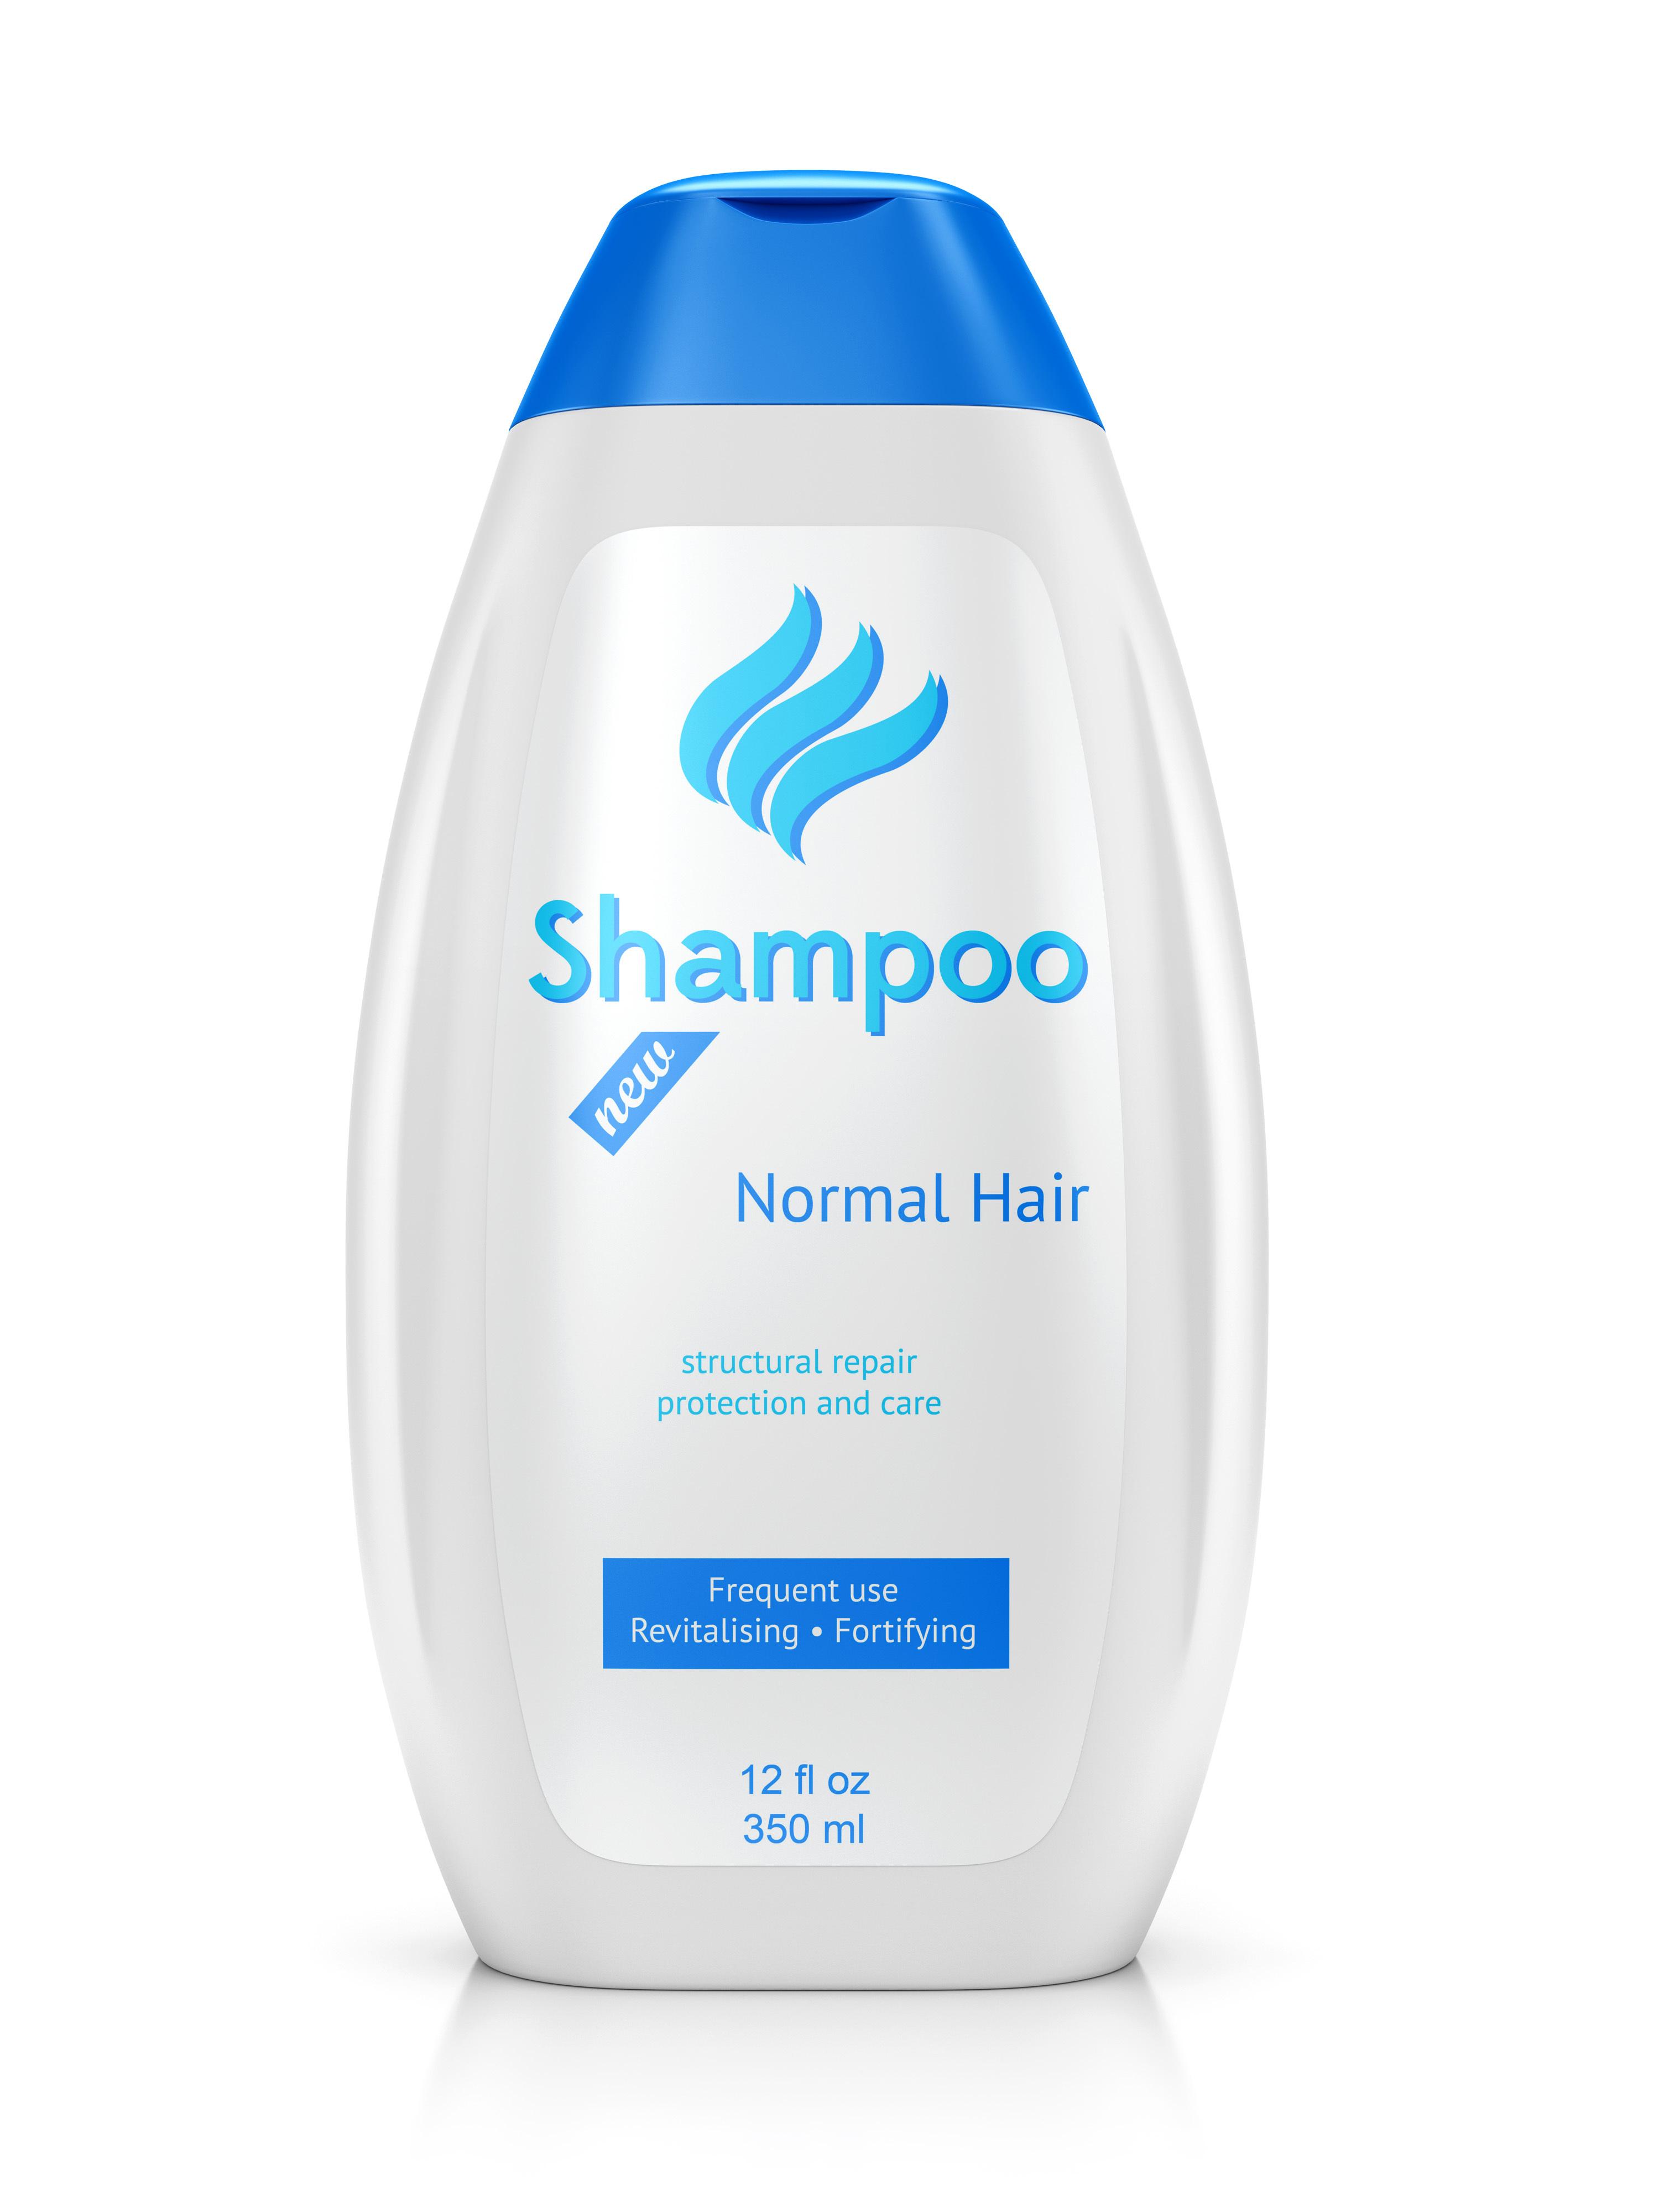 Normal Hair Shampoo Categories